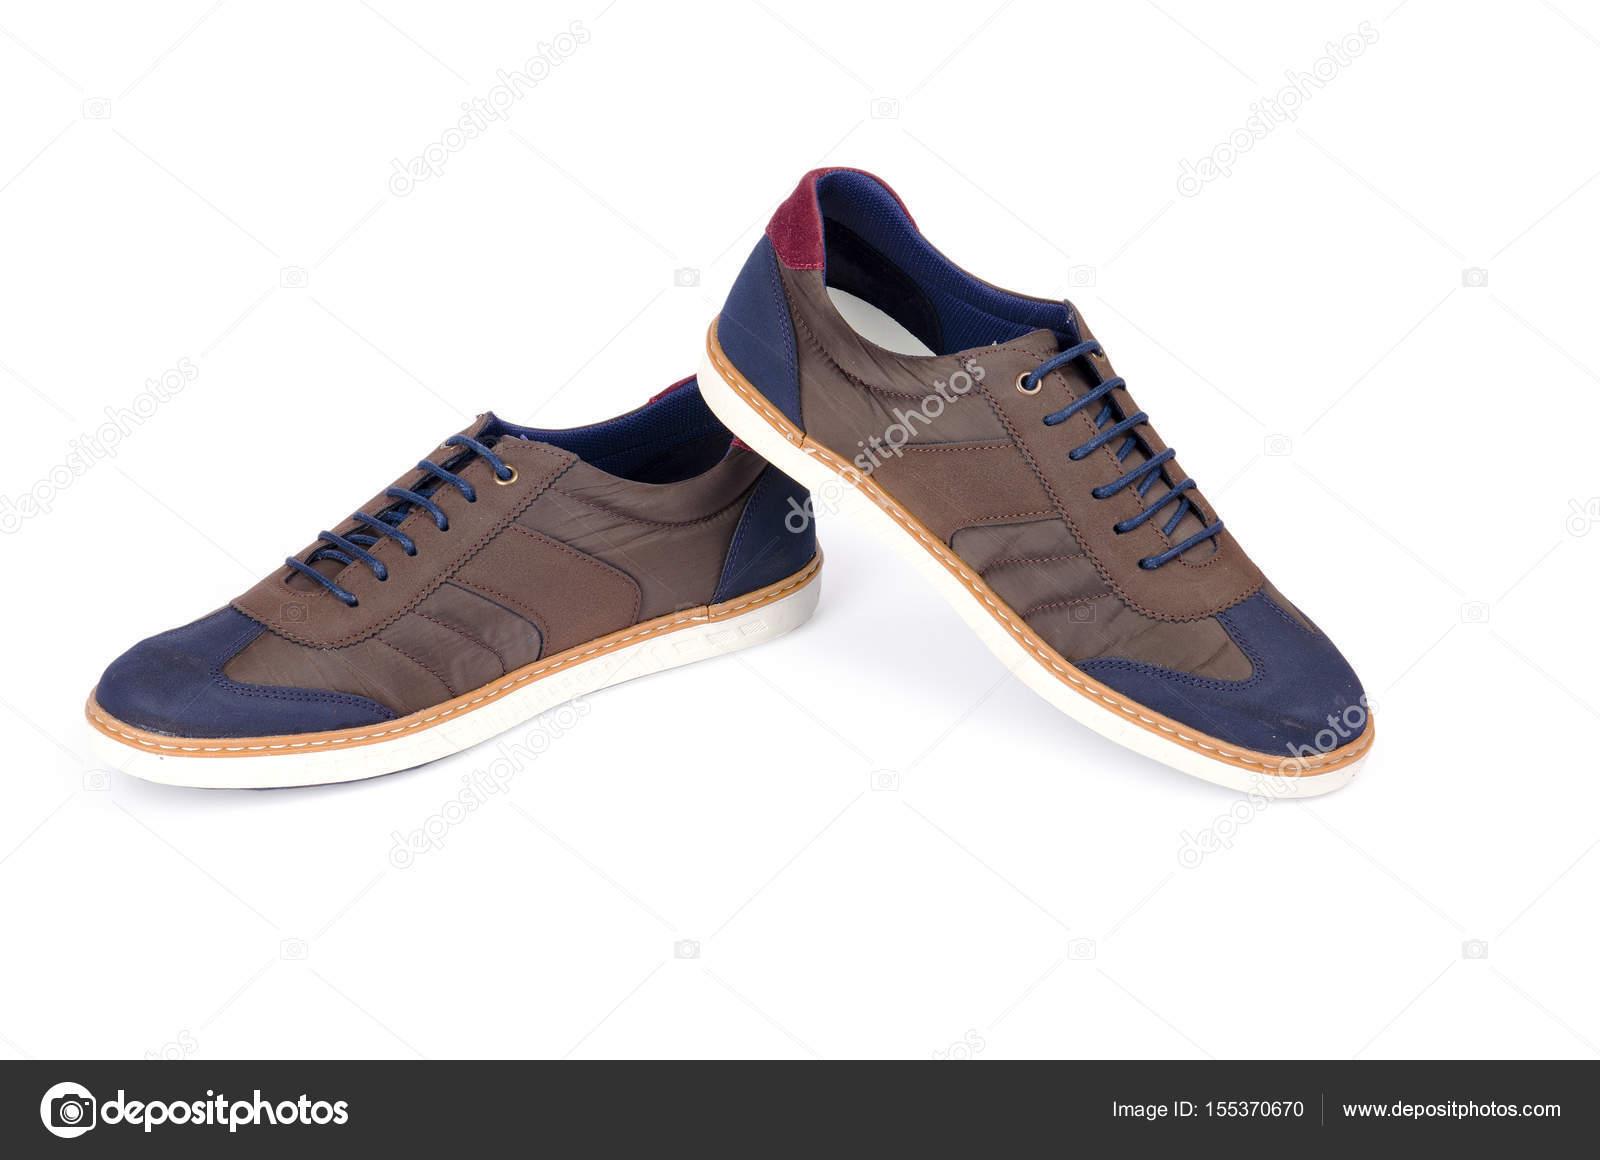 Braune Mann Sneakers isoliert auf weiss — Stockfoto © Nasimi  155370670 106f2c55c3